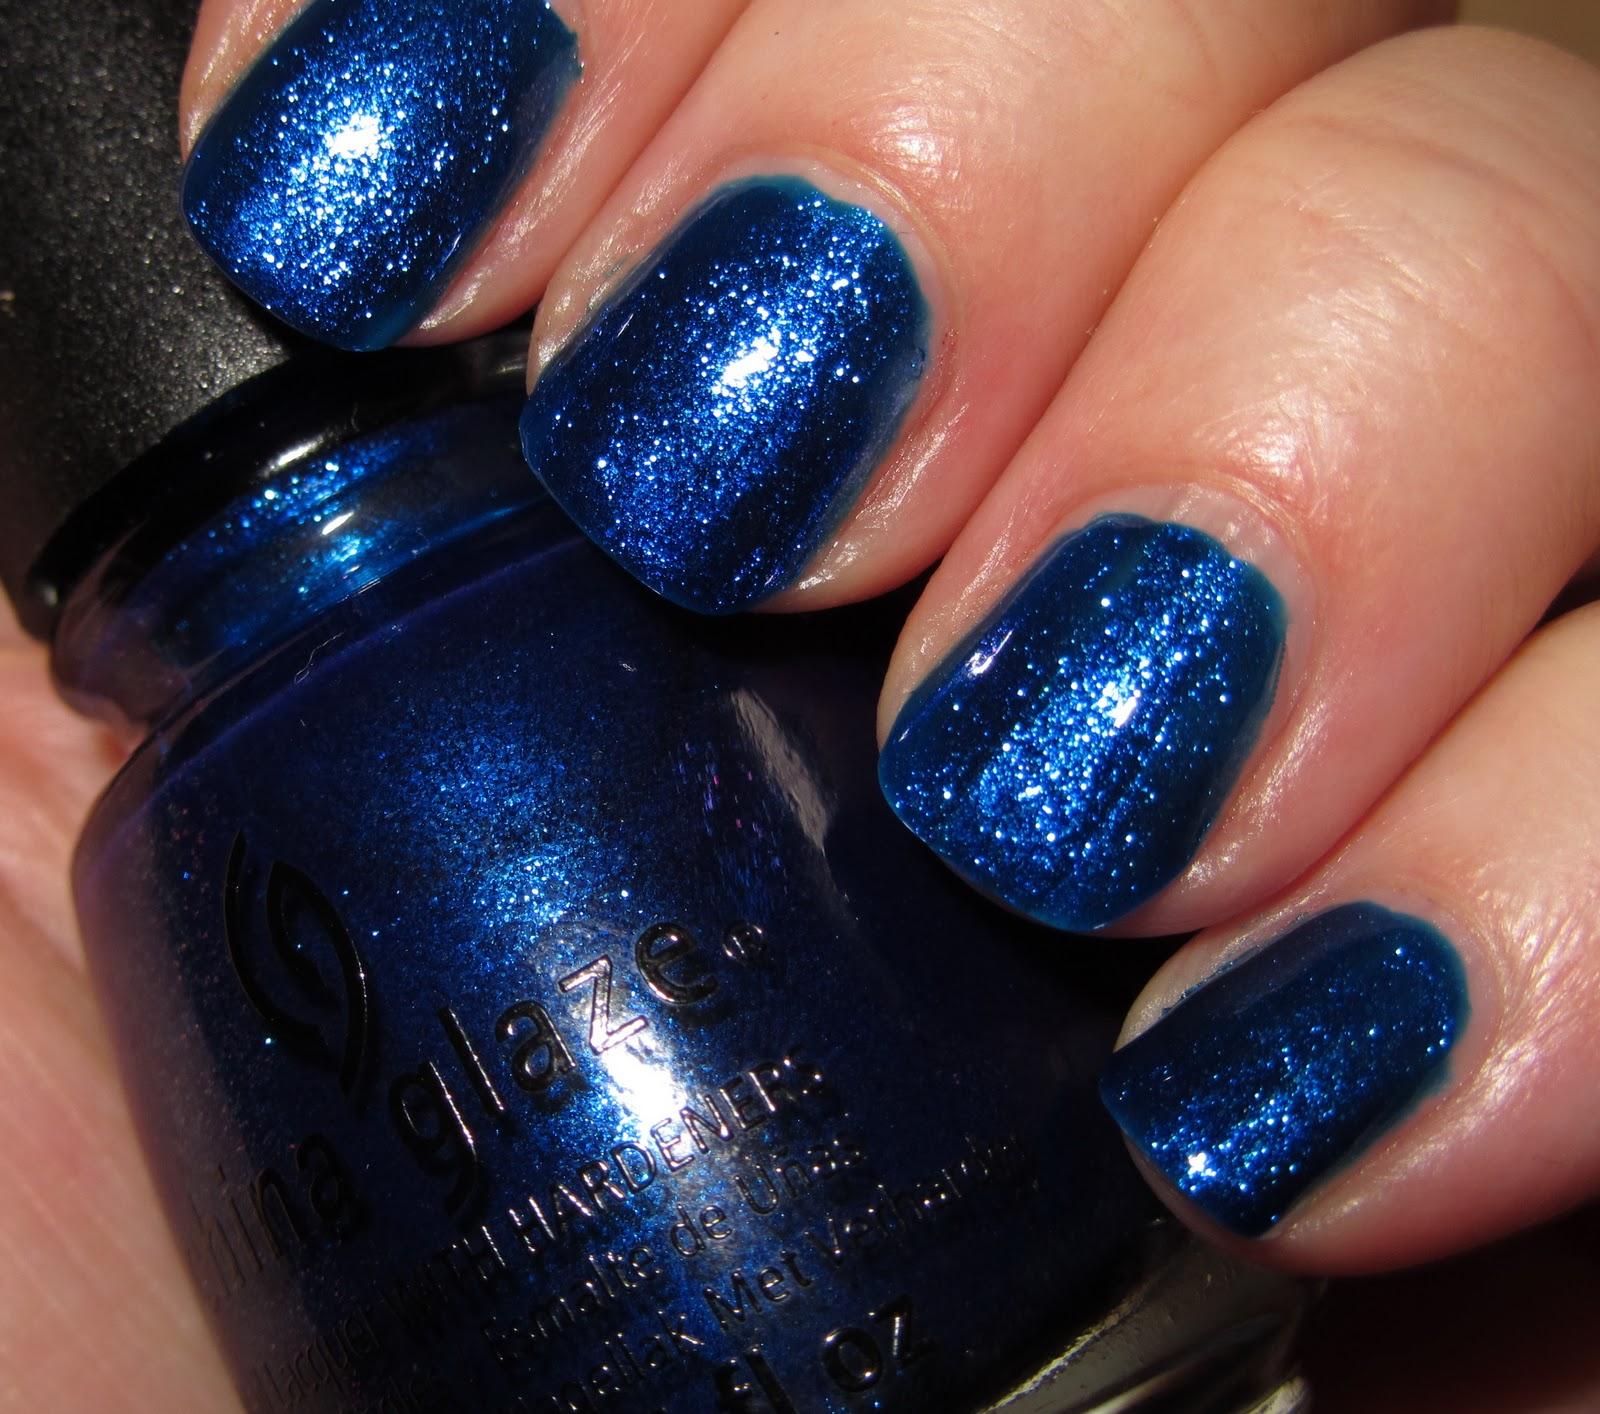 marias nail art and polish blog: blue year's eve - china glaze let